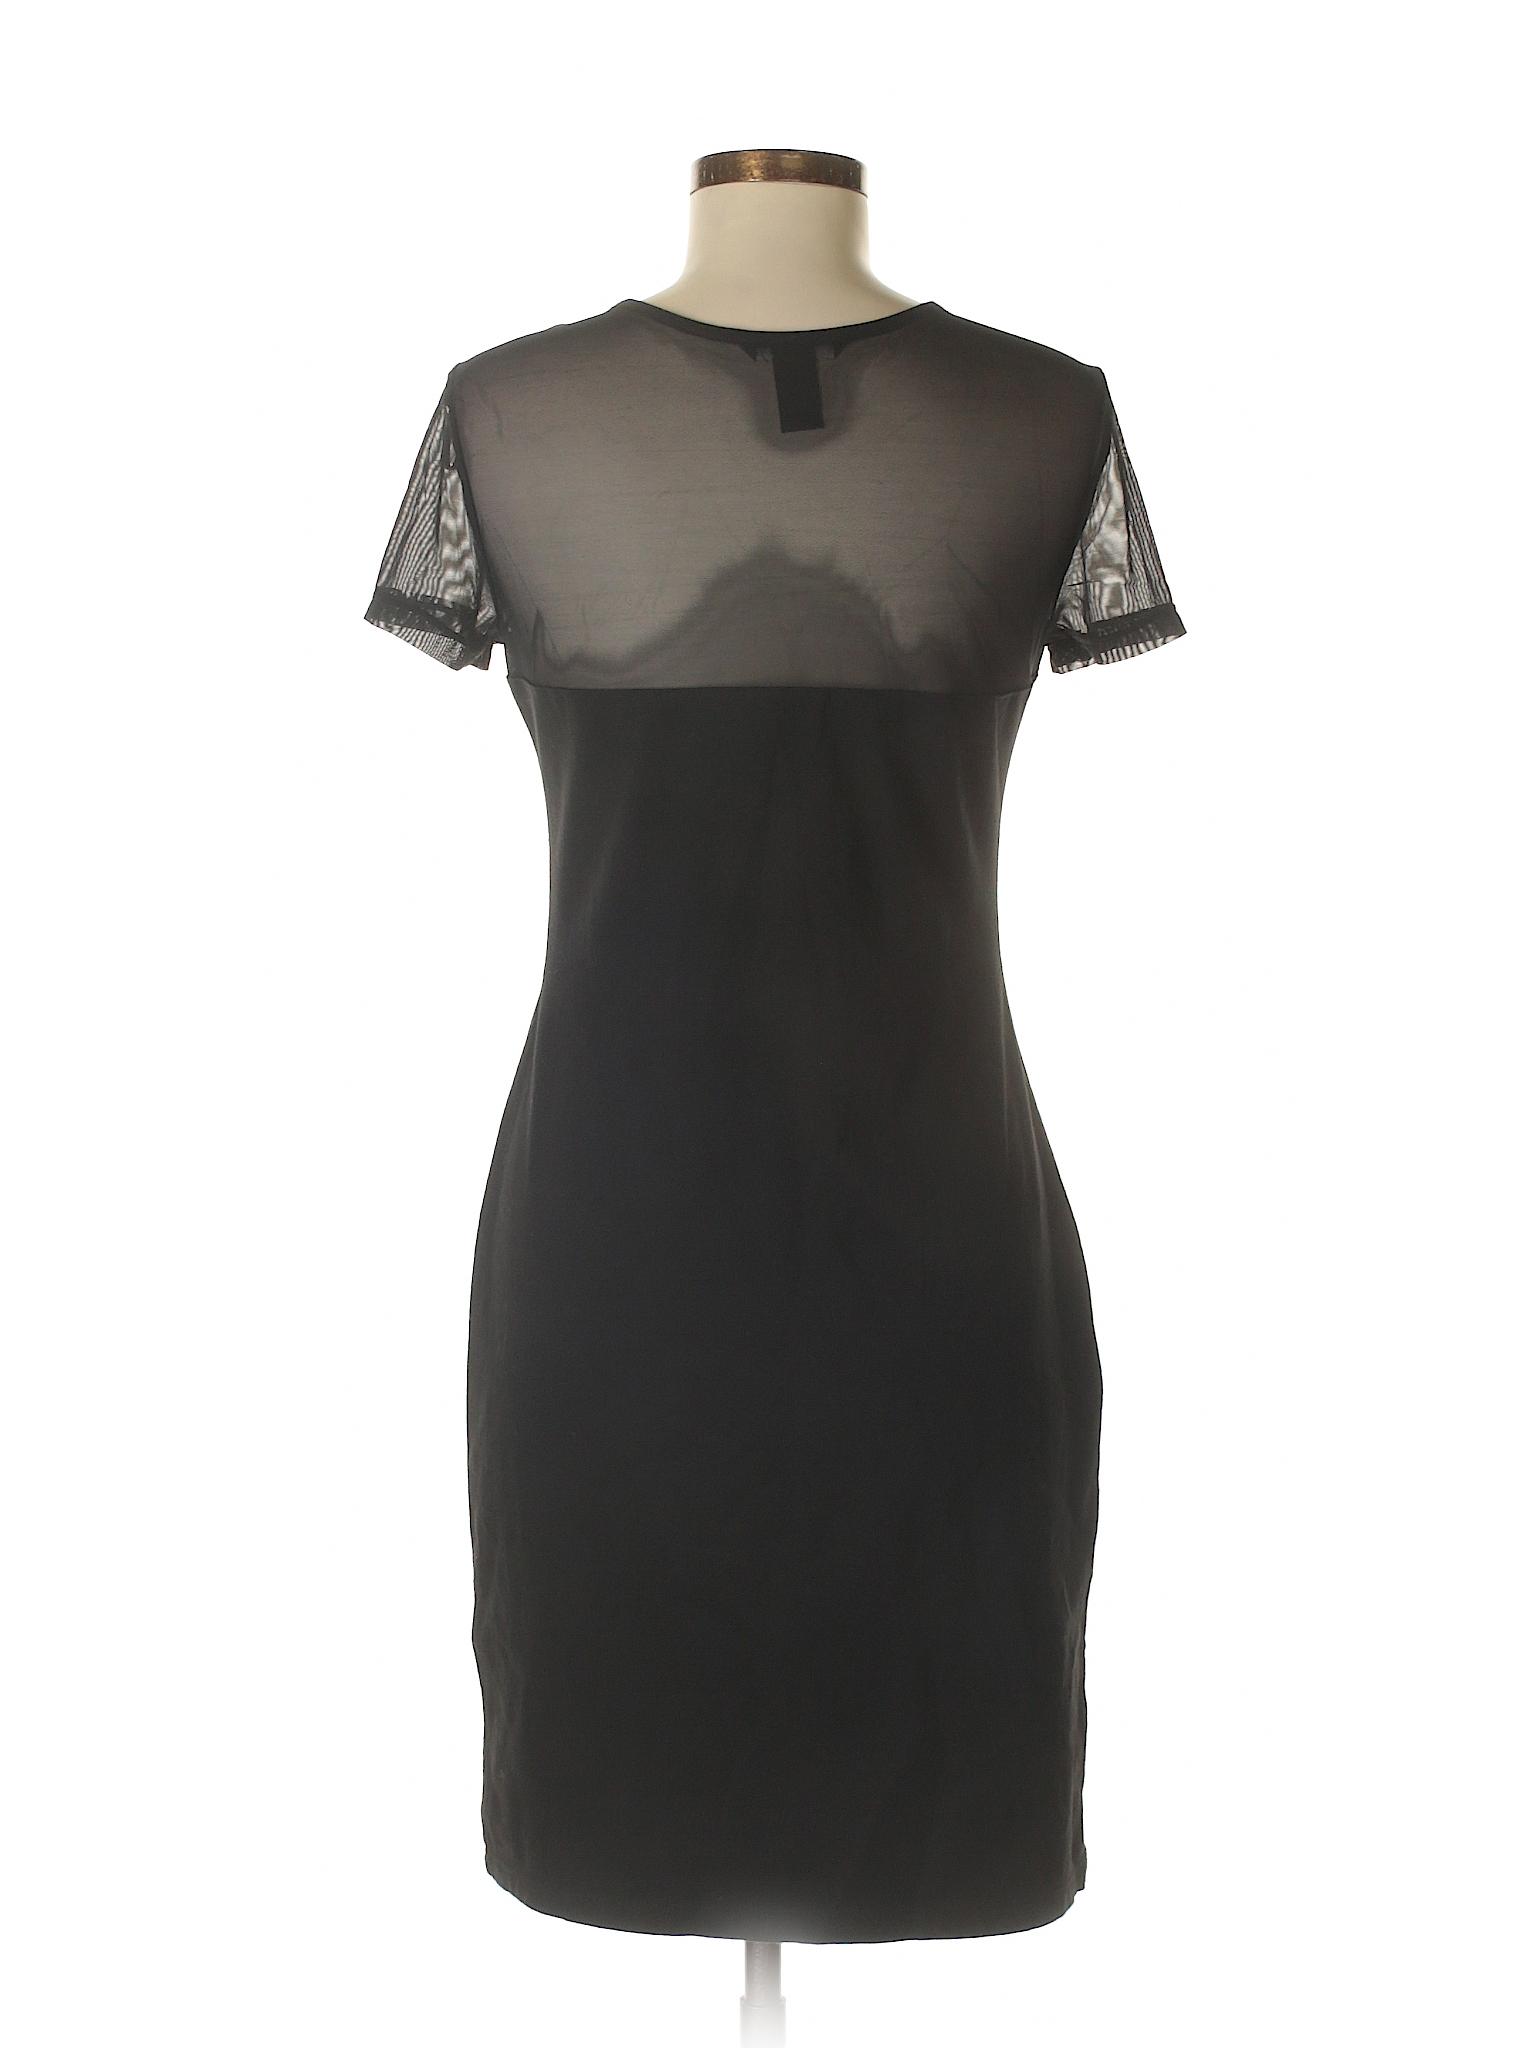 H Boutique Winter Dress amp;m Casual qx5zw56a